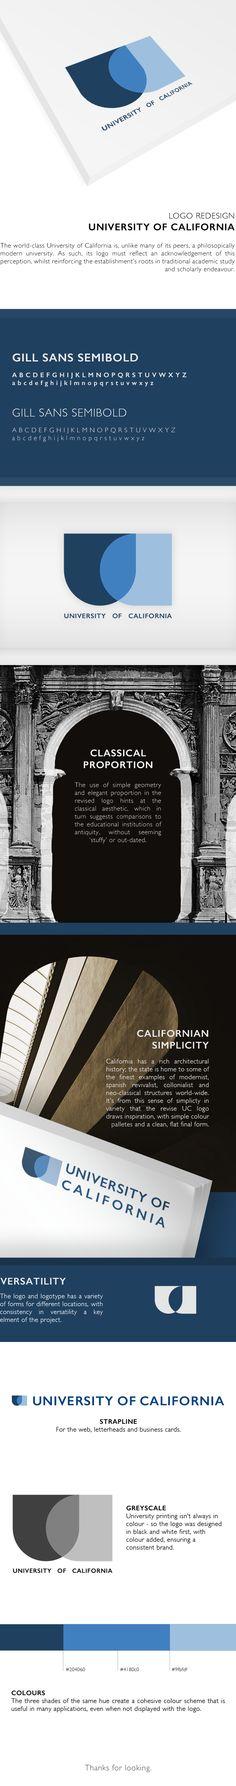 University of California - Logo Redesign by Oliver Wilson, via Behance #Redesign #Logo #Identity #Branding